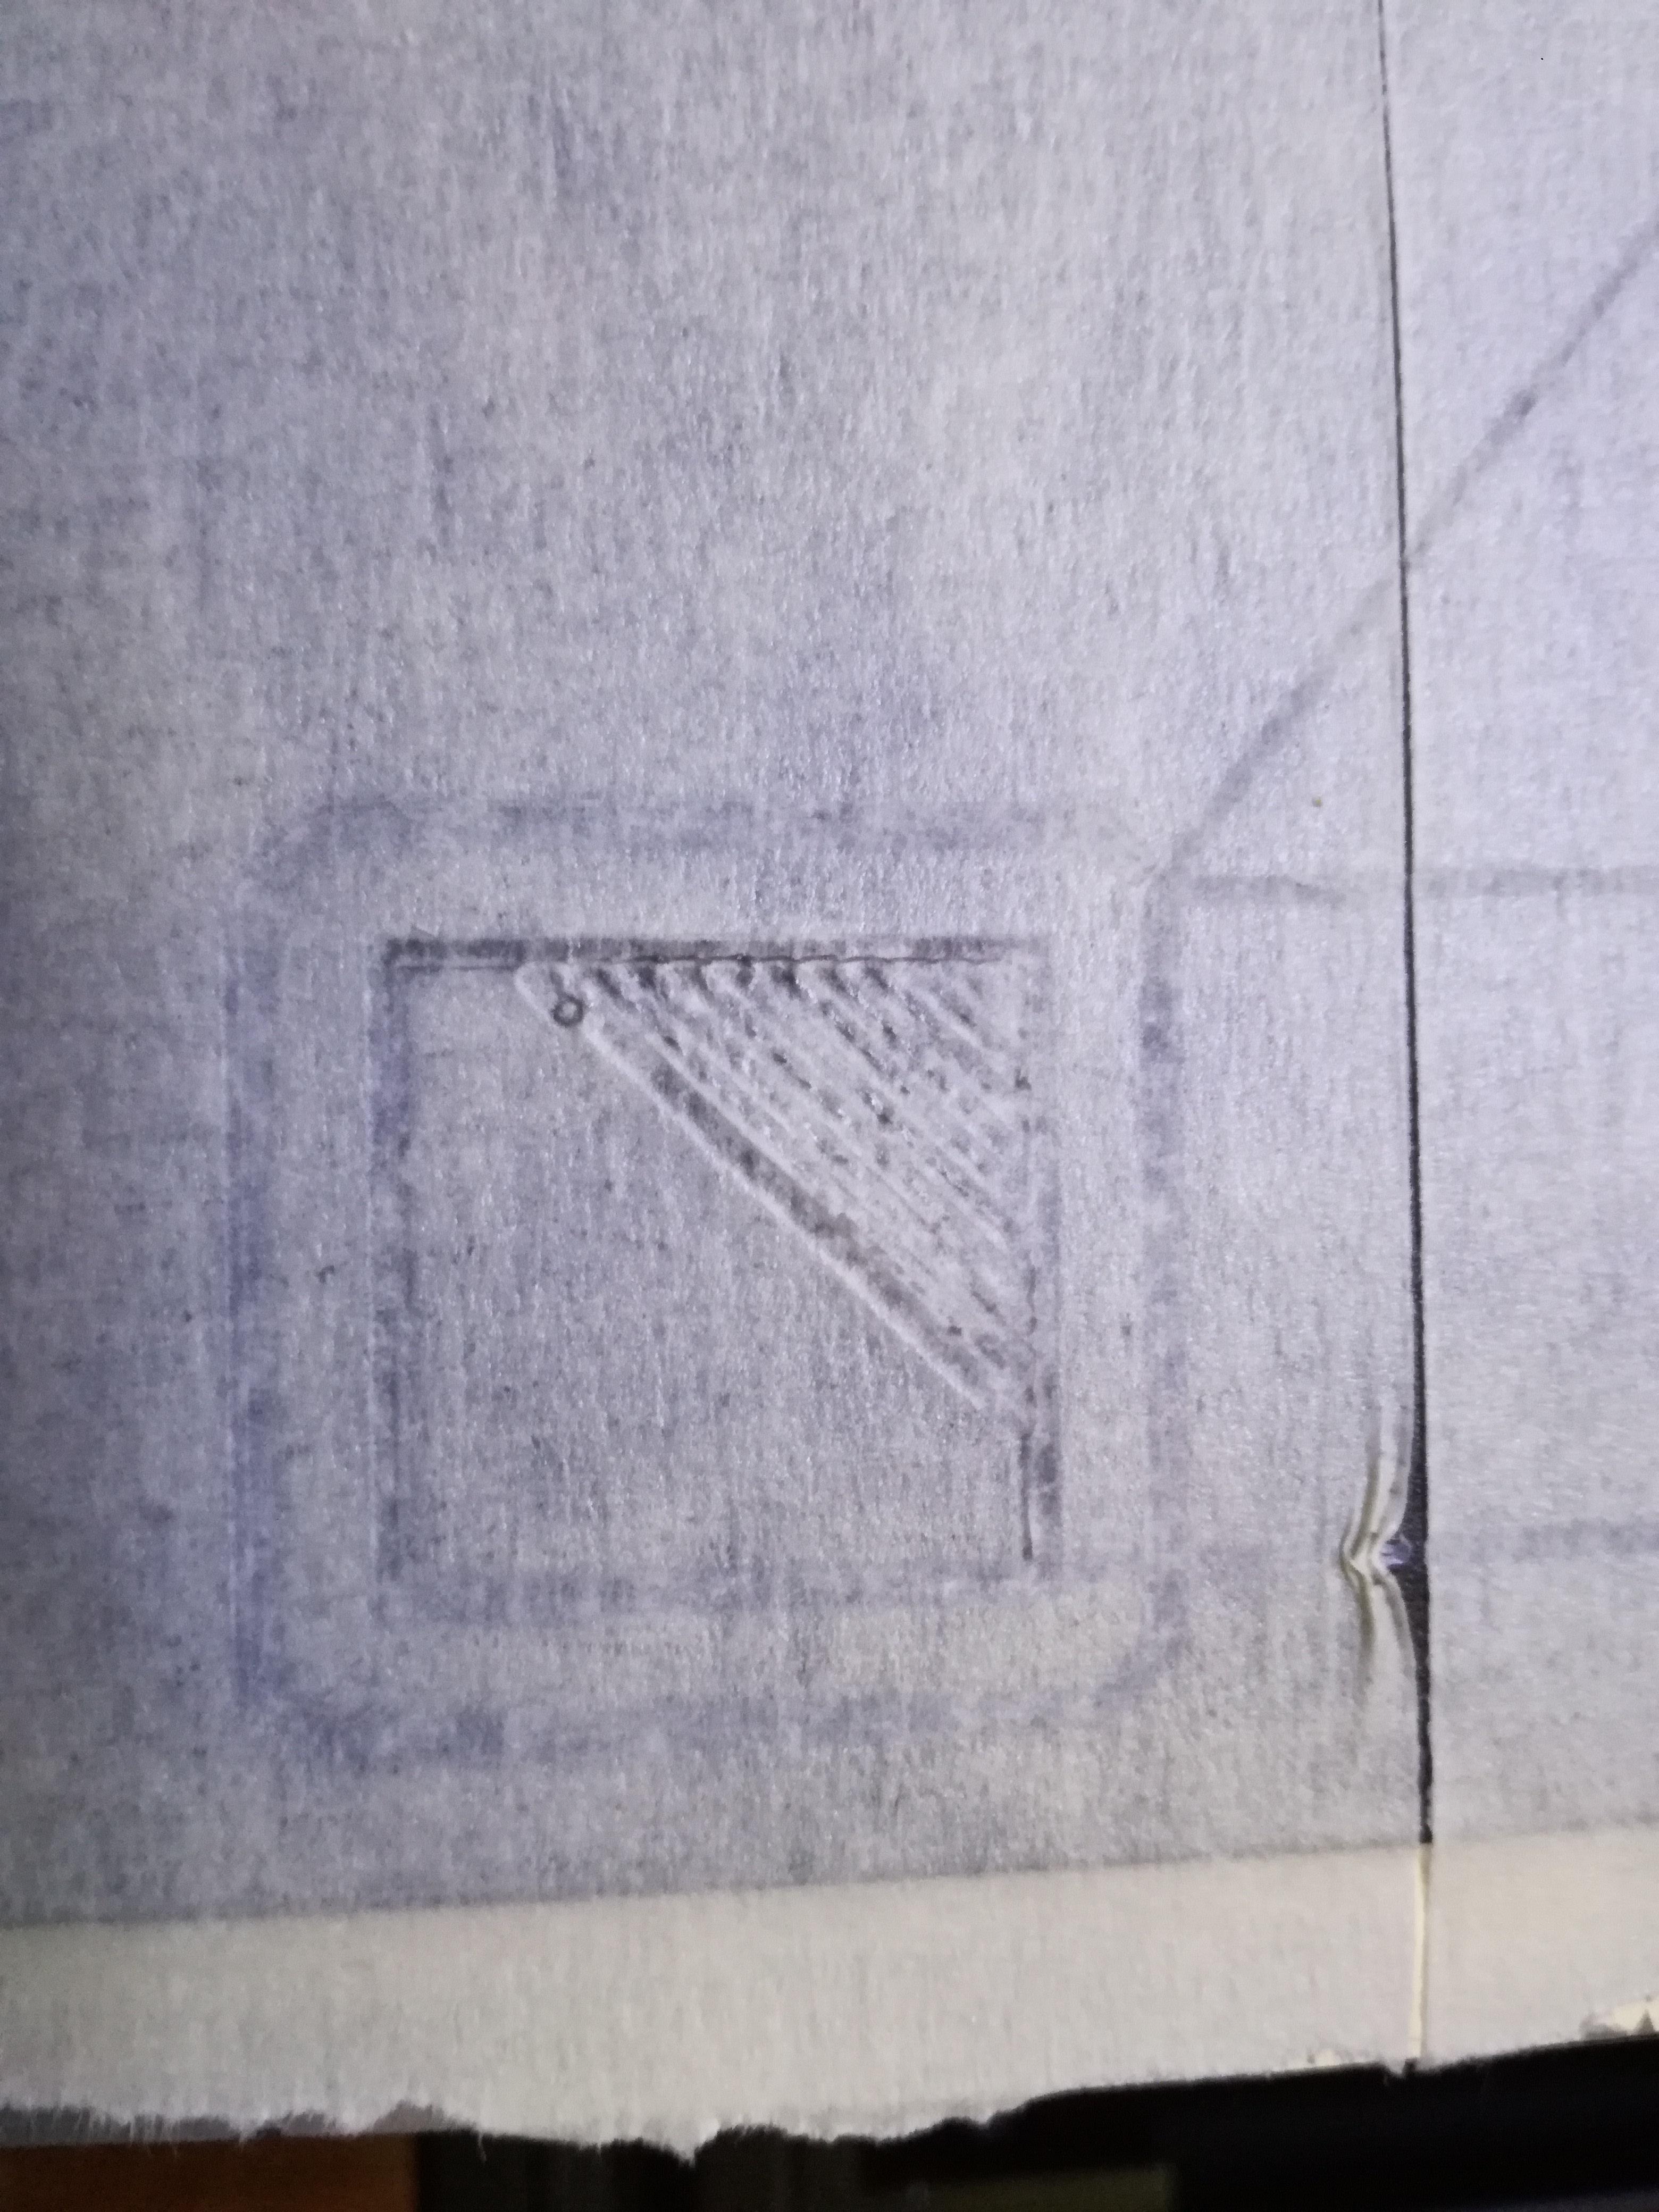 Developers - [FR] Z offset not same on all bed using Bilinear -